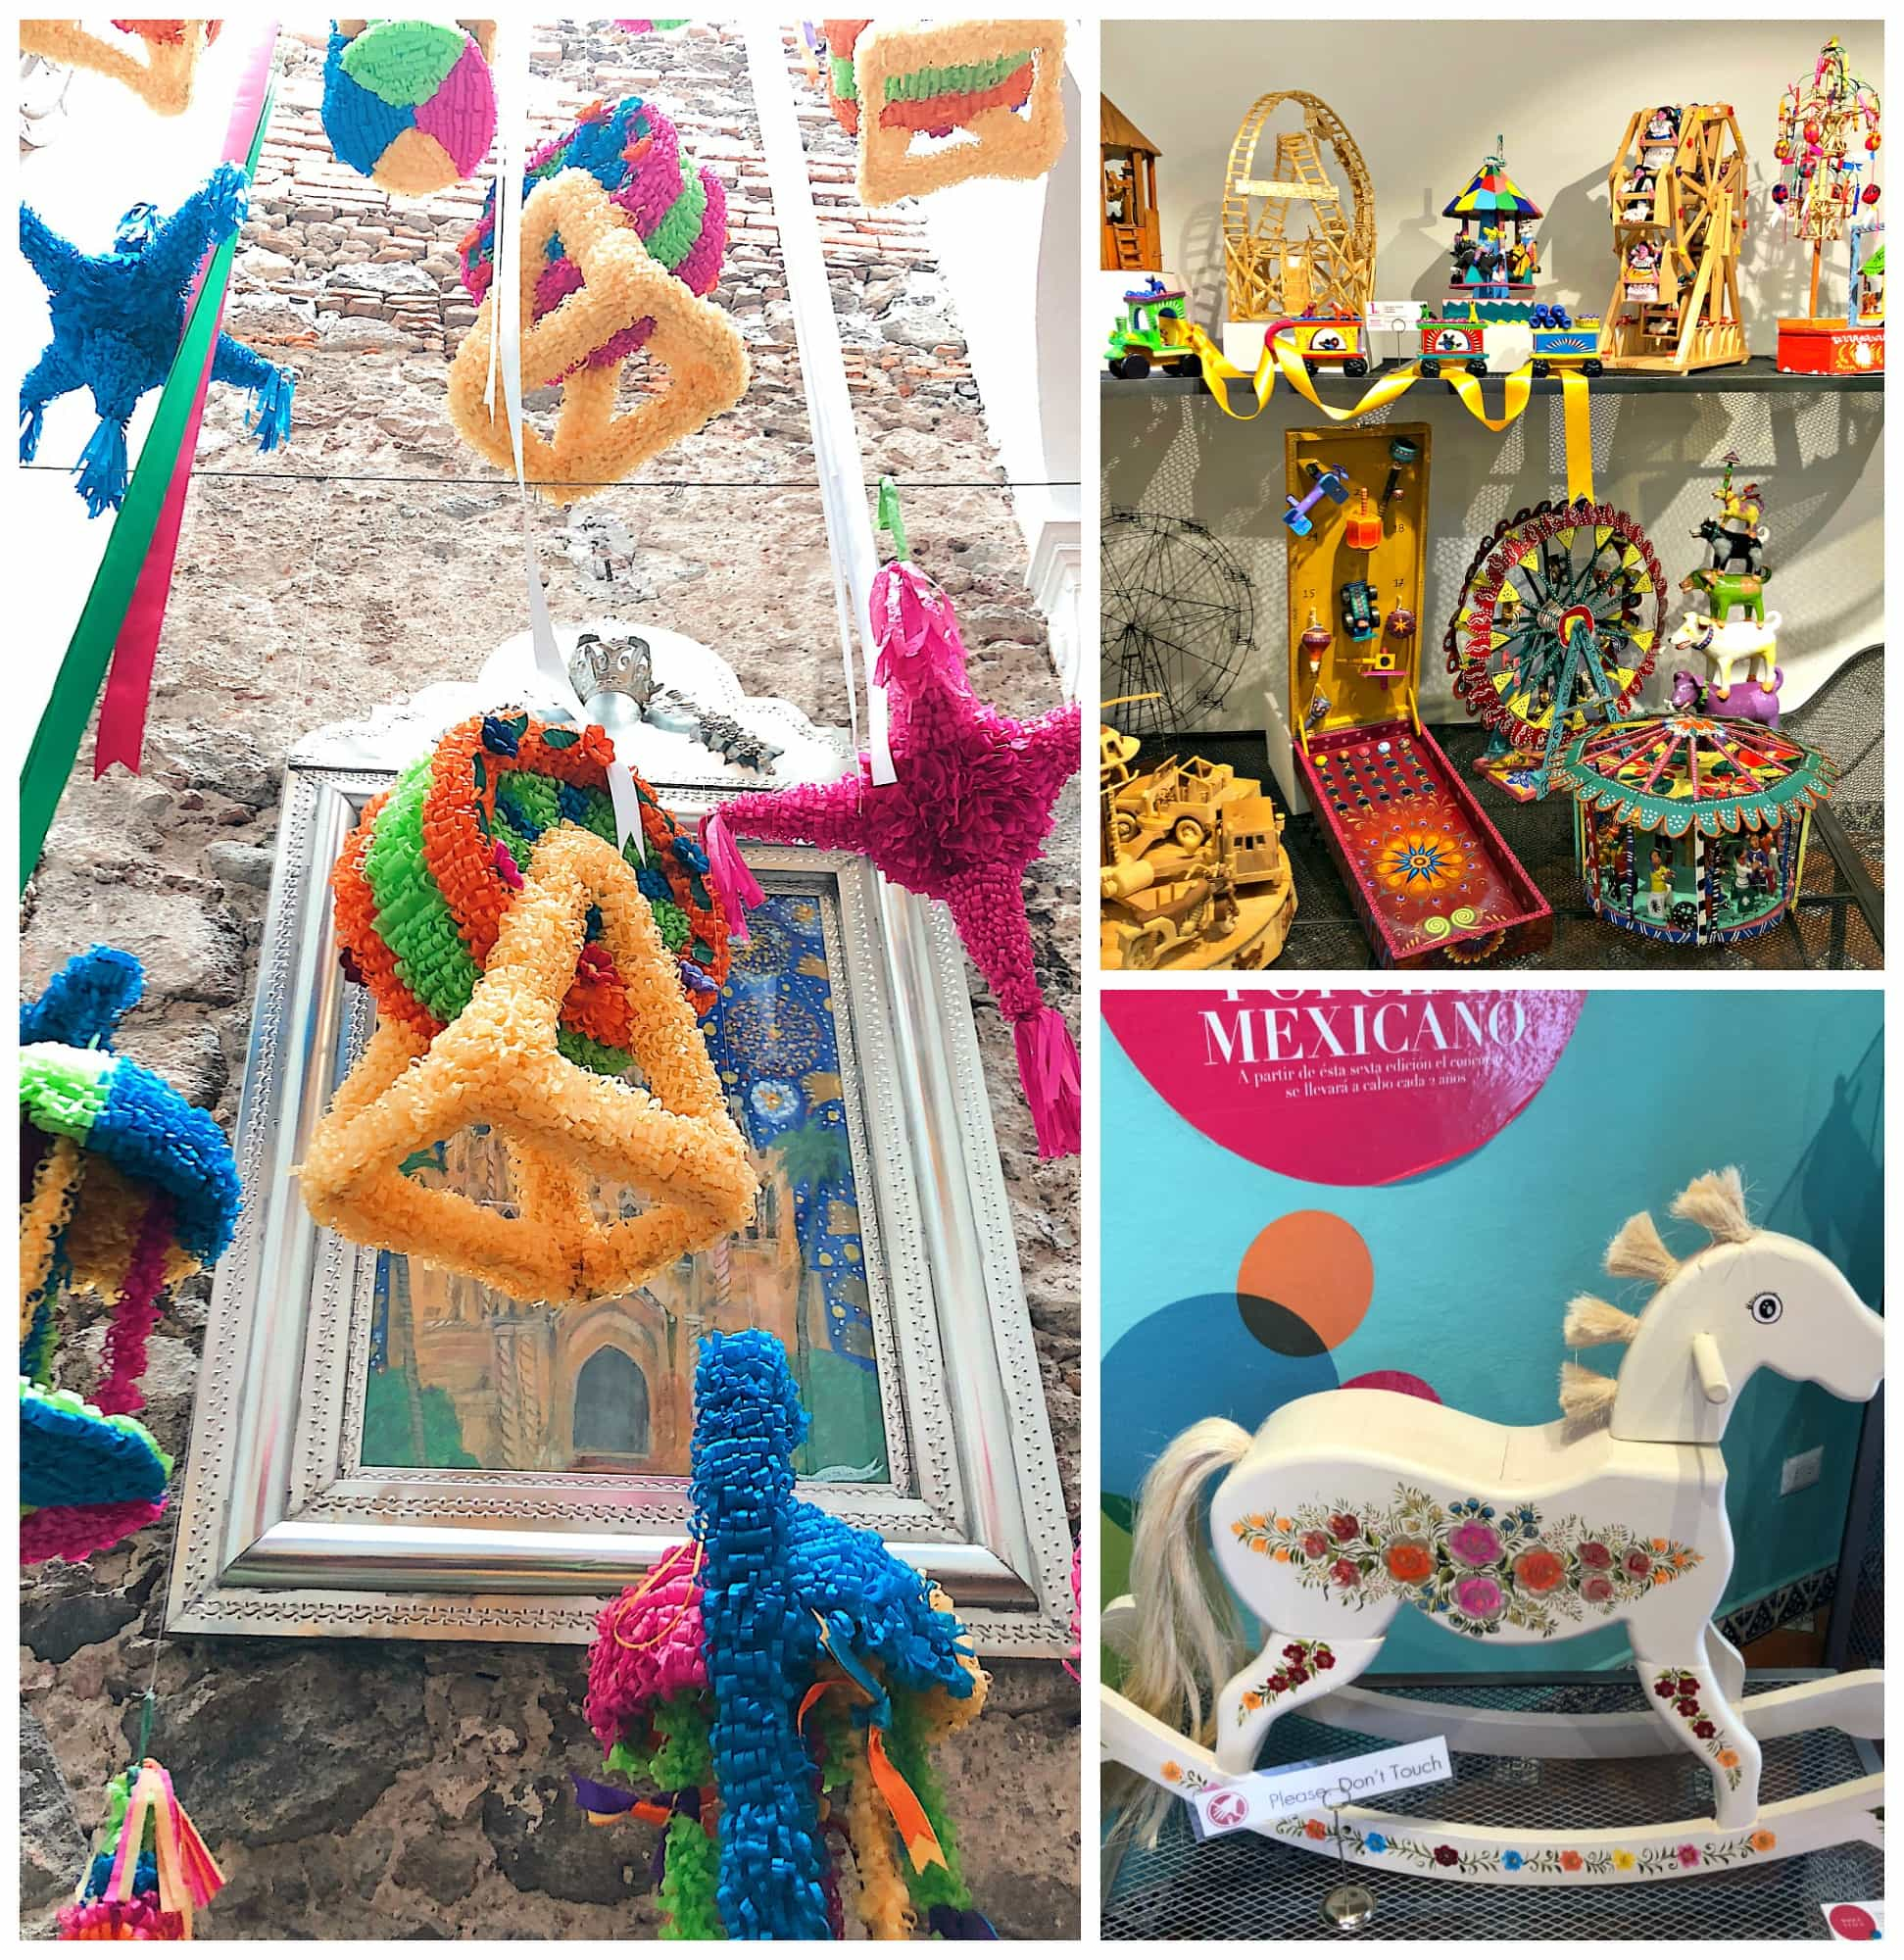 San Miguel de Allende's Toy Museum